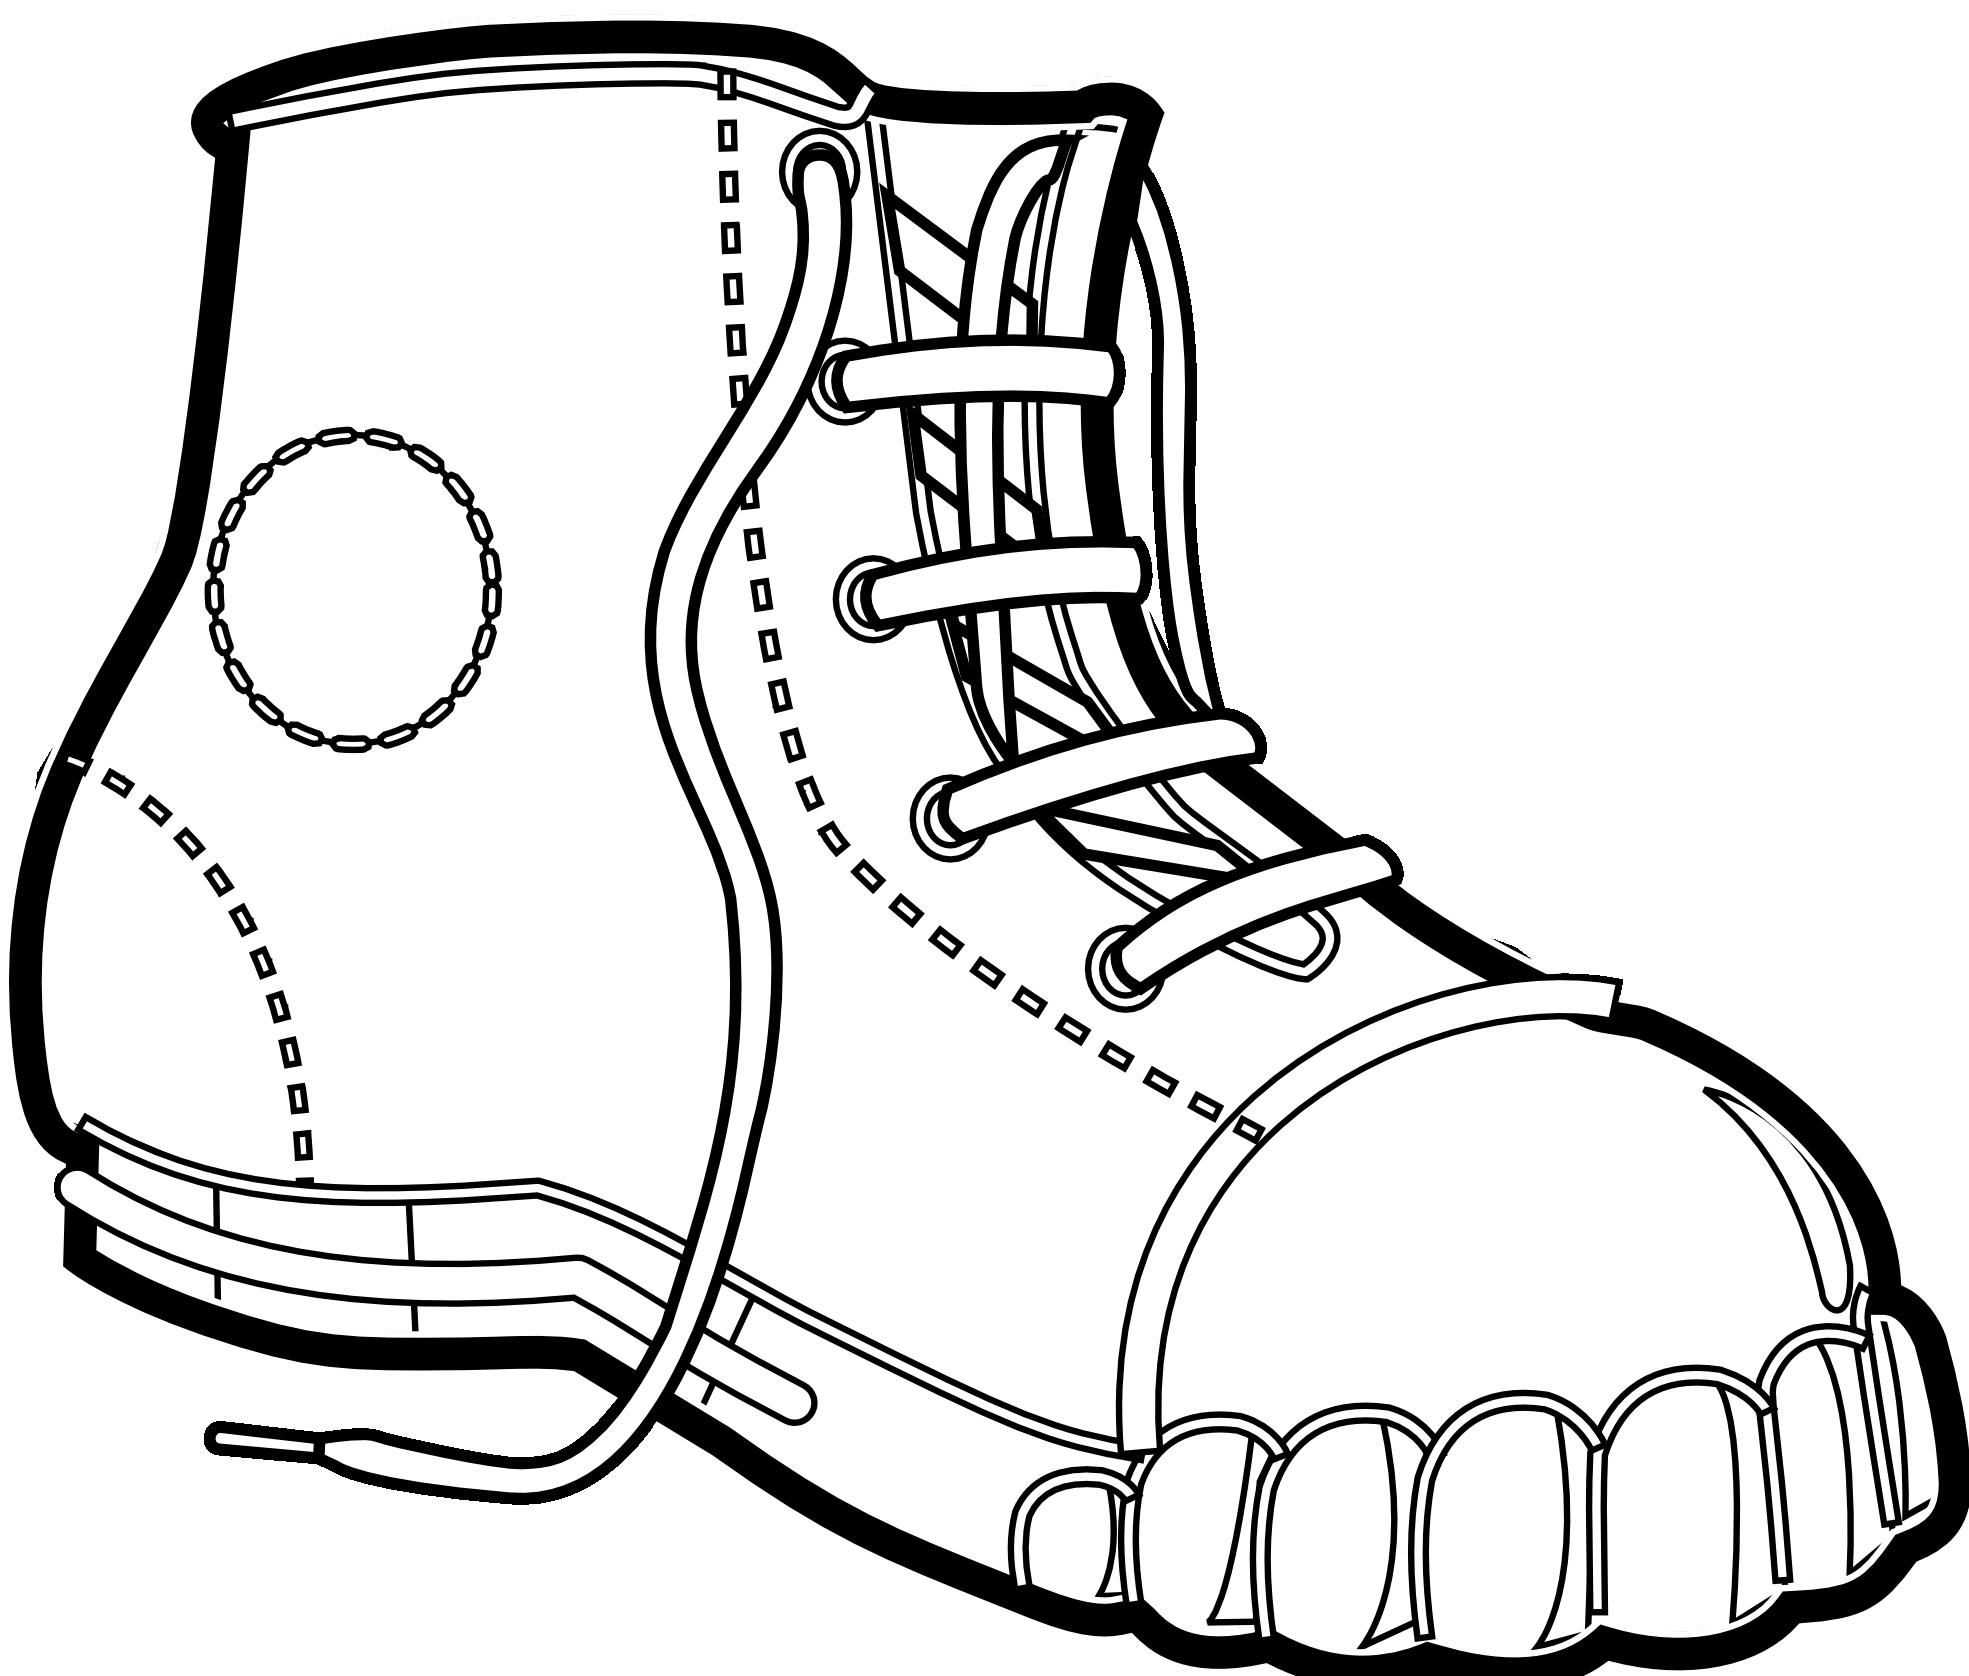 Combat boot clipart.